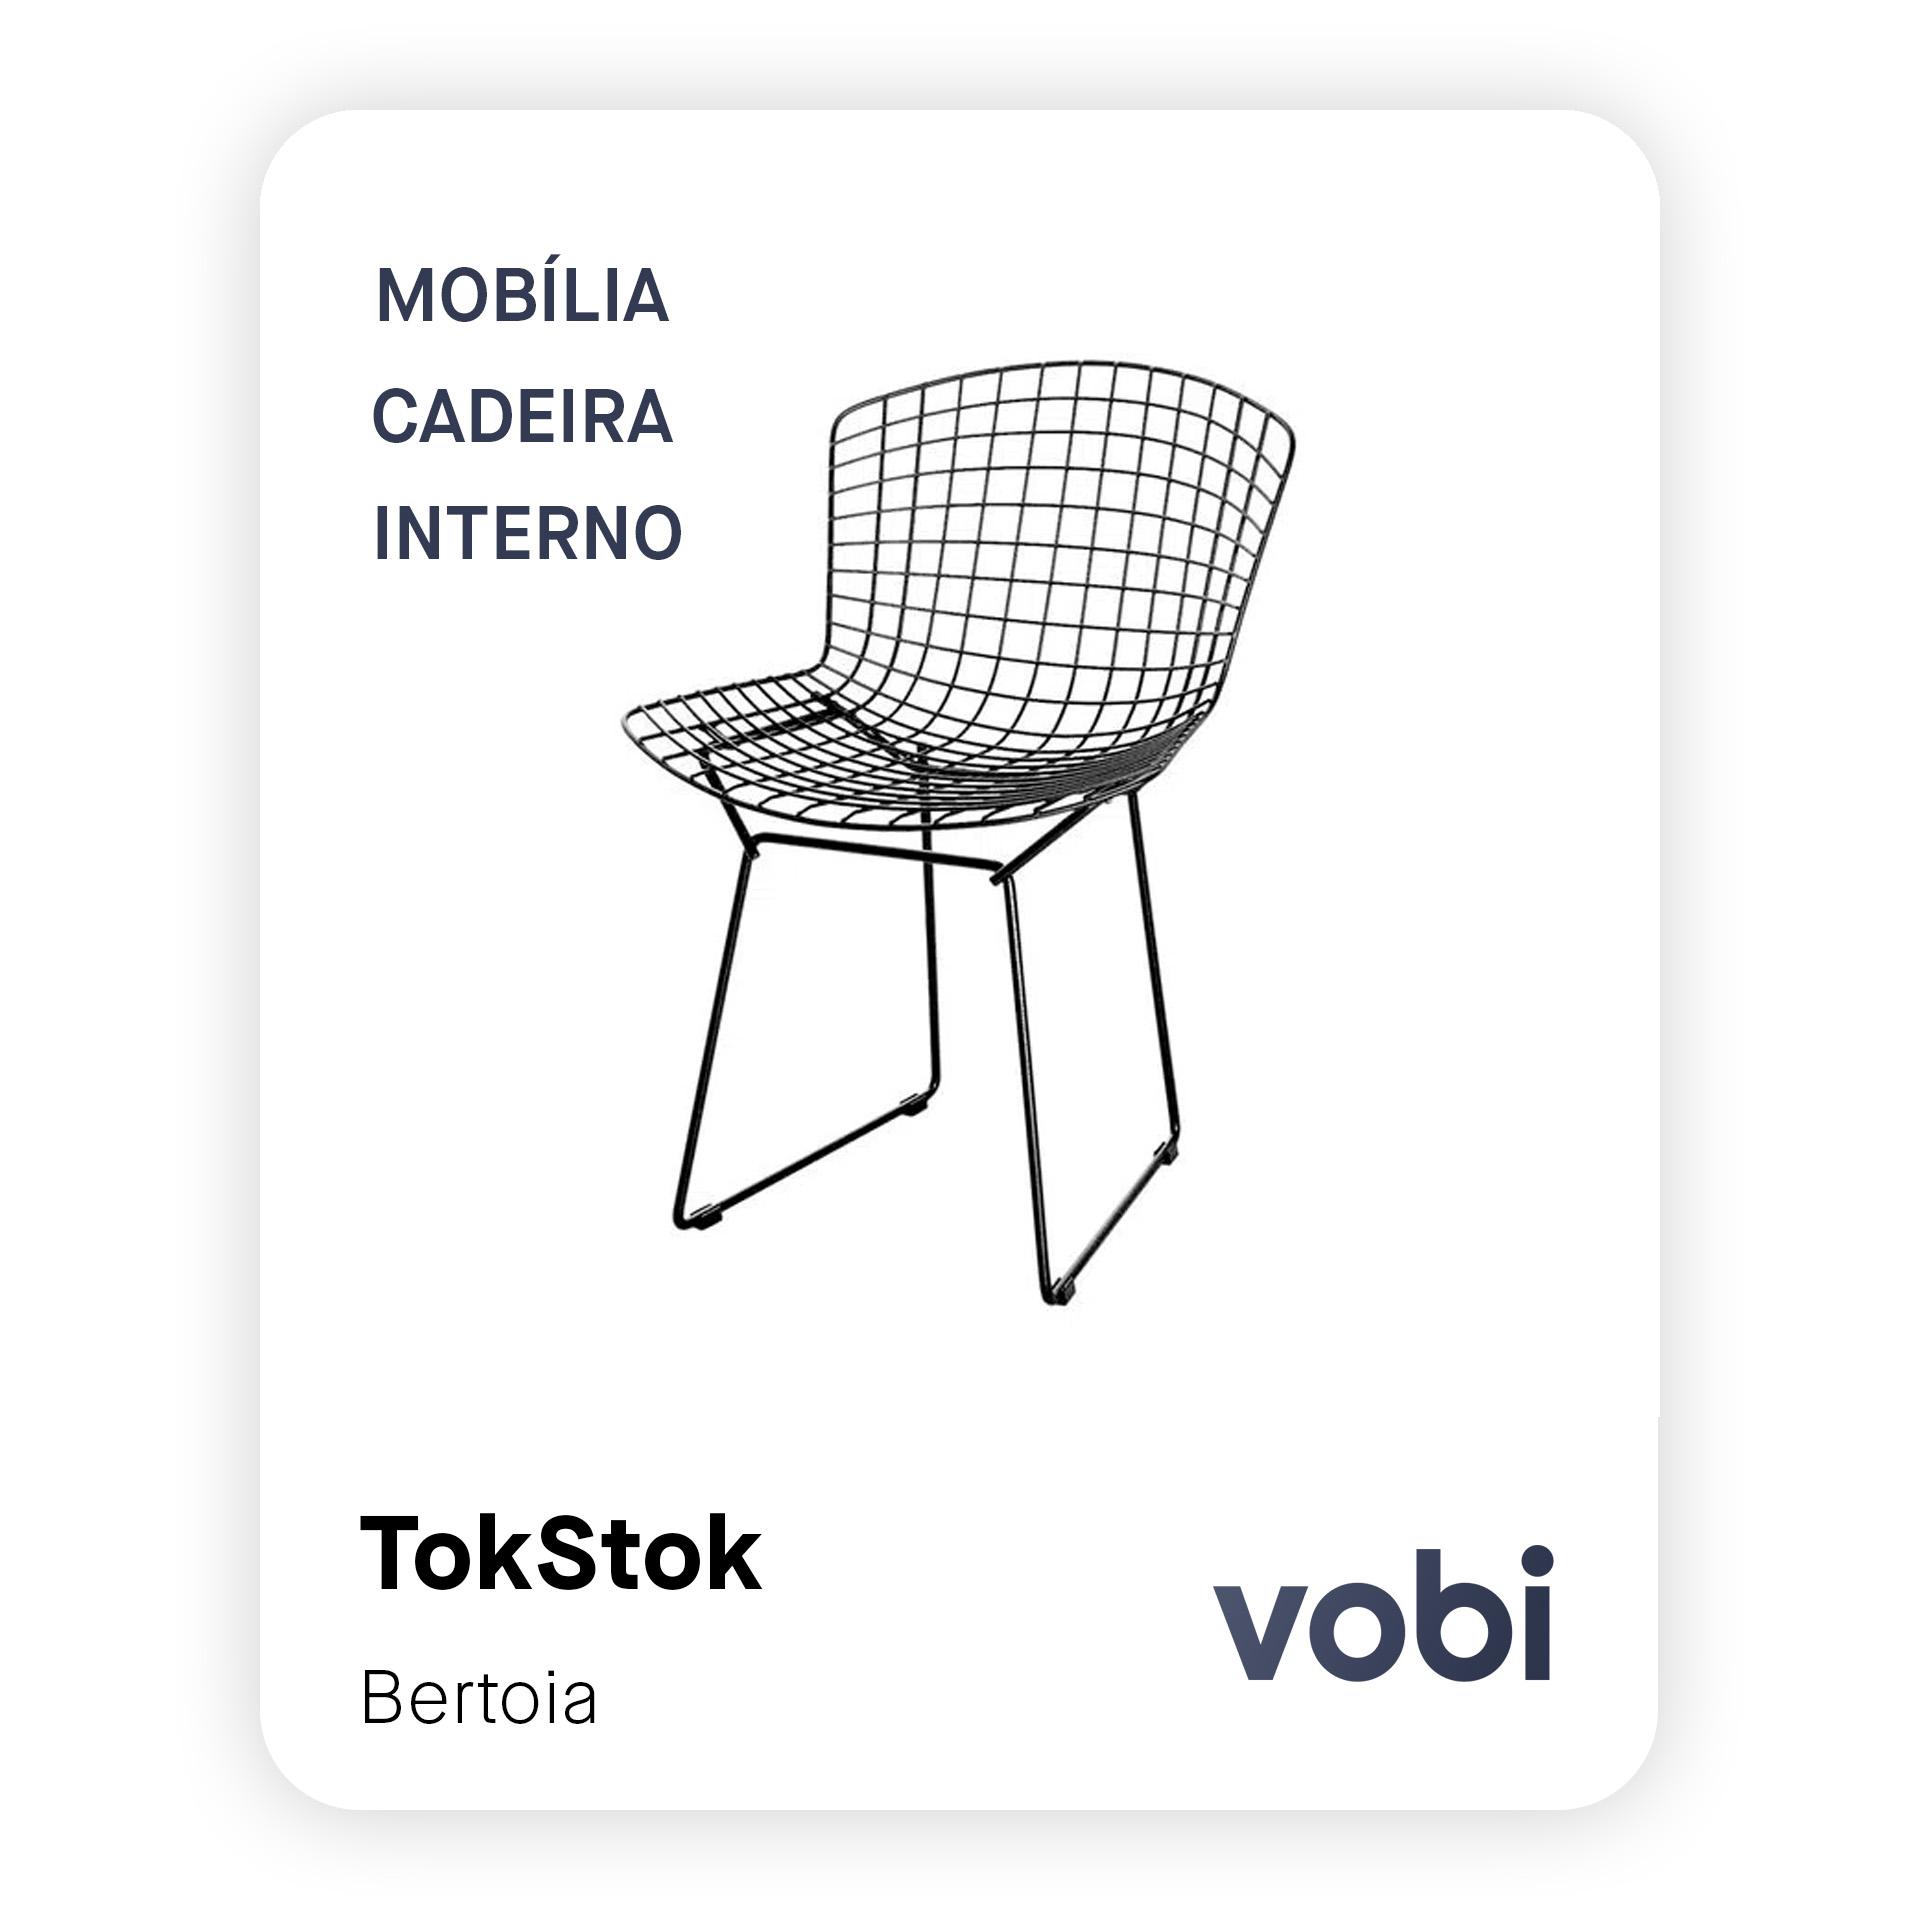 mobília cadeira bertoia